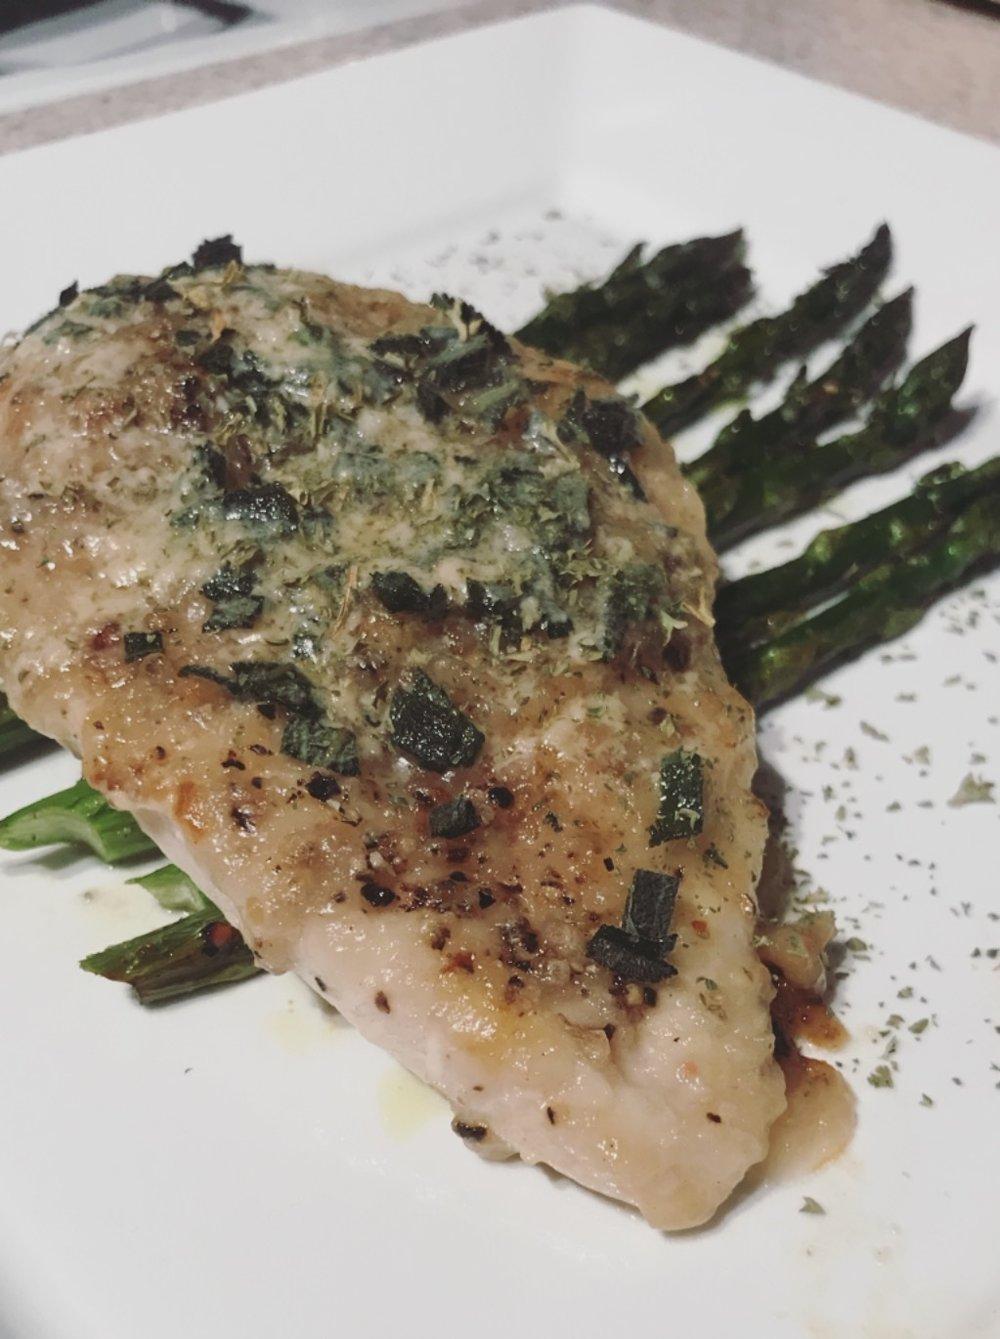 Creamy Dijon Chicken + Oven Roasted Asparagus - Tuesday Night Dinner!